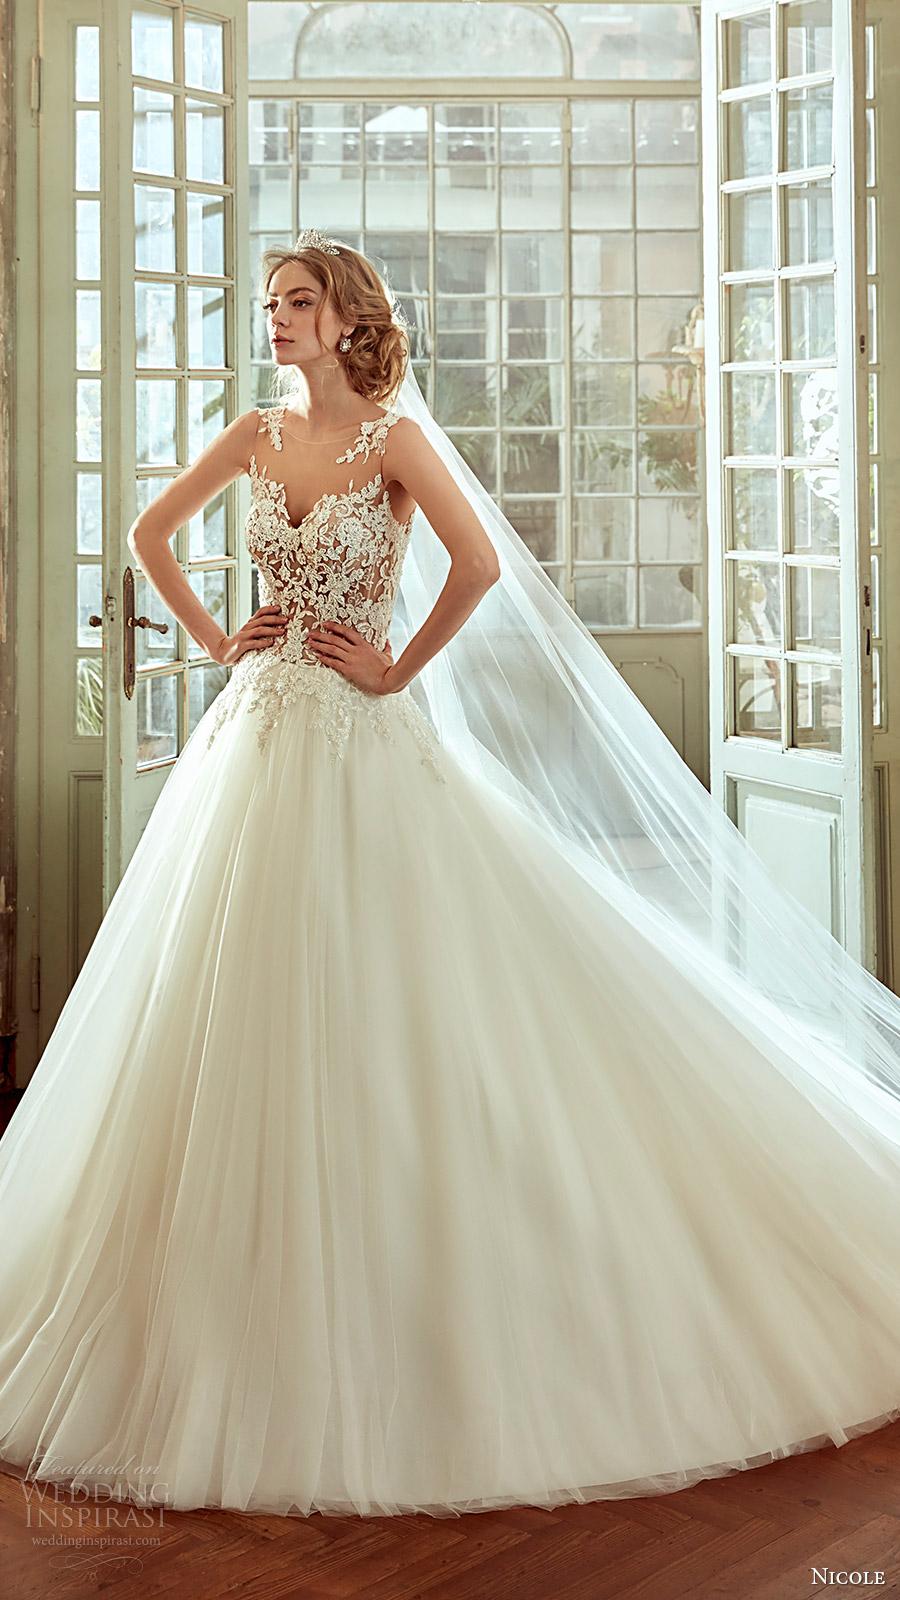 Nicole 2017 wedding dresses wedding inspirasi for Nicole spose wedding dress prices